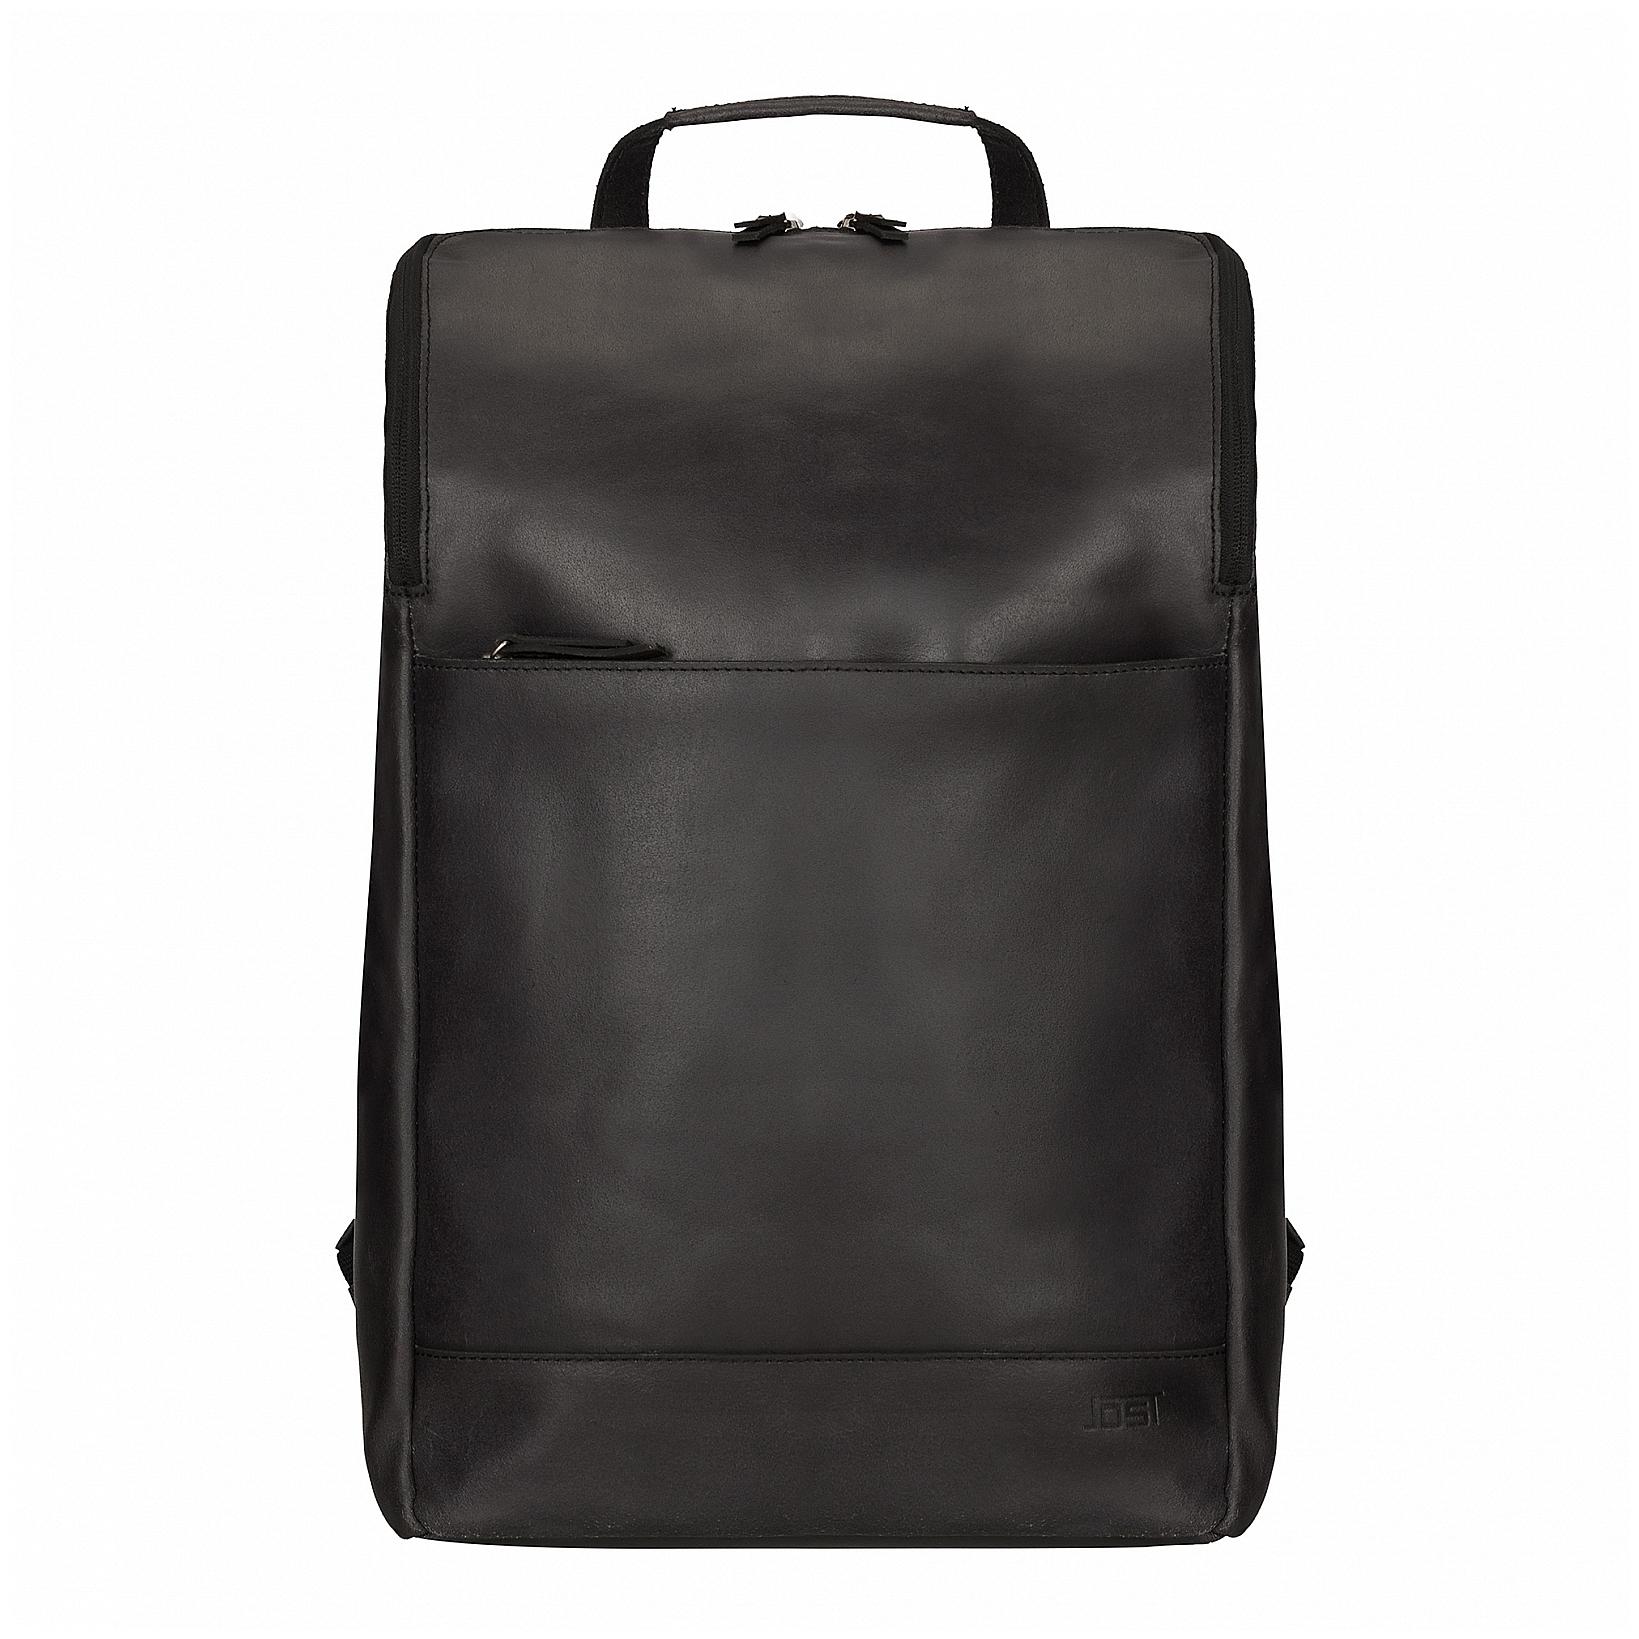 3f1d97902e JOST Kožený batoh na notebook NARVIK 1349 černý